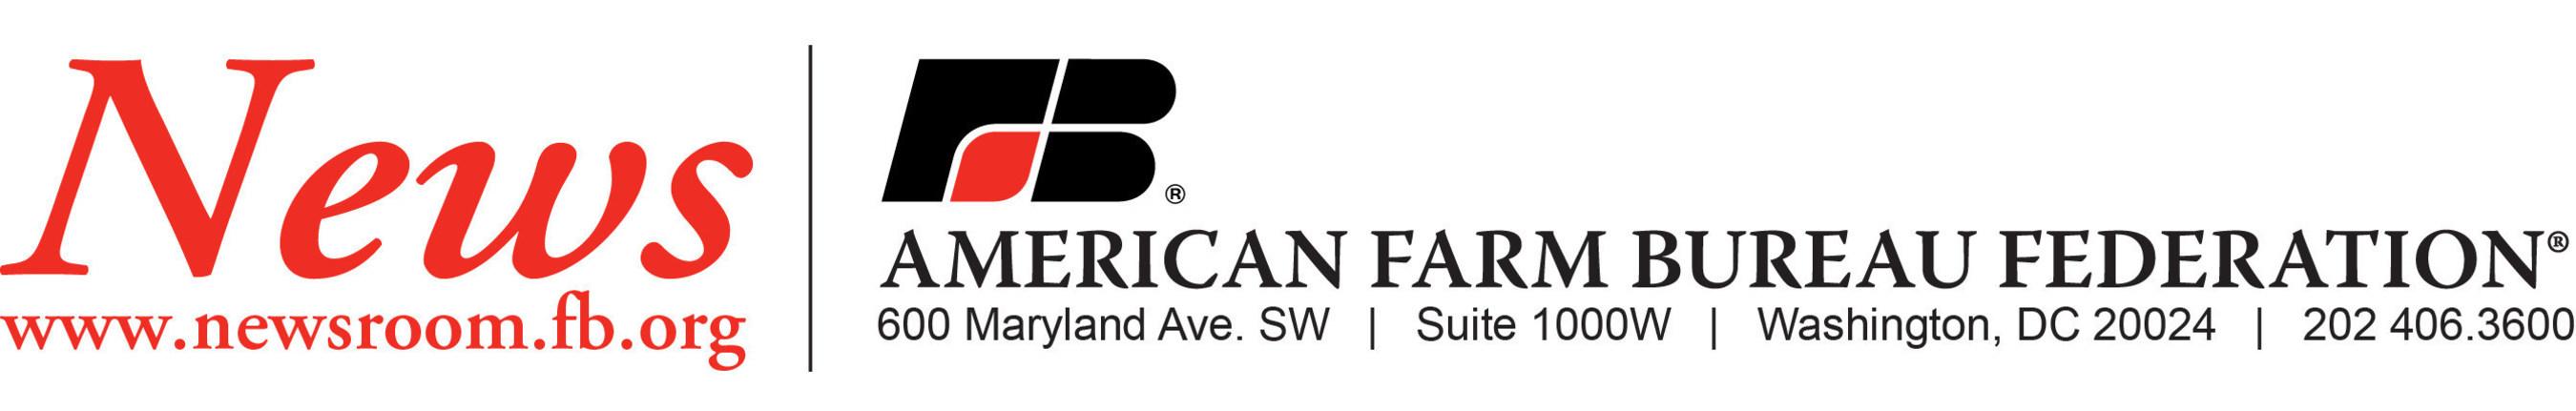 American Farm Bureau Federation News release letterhead